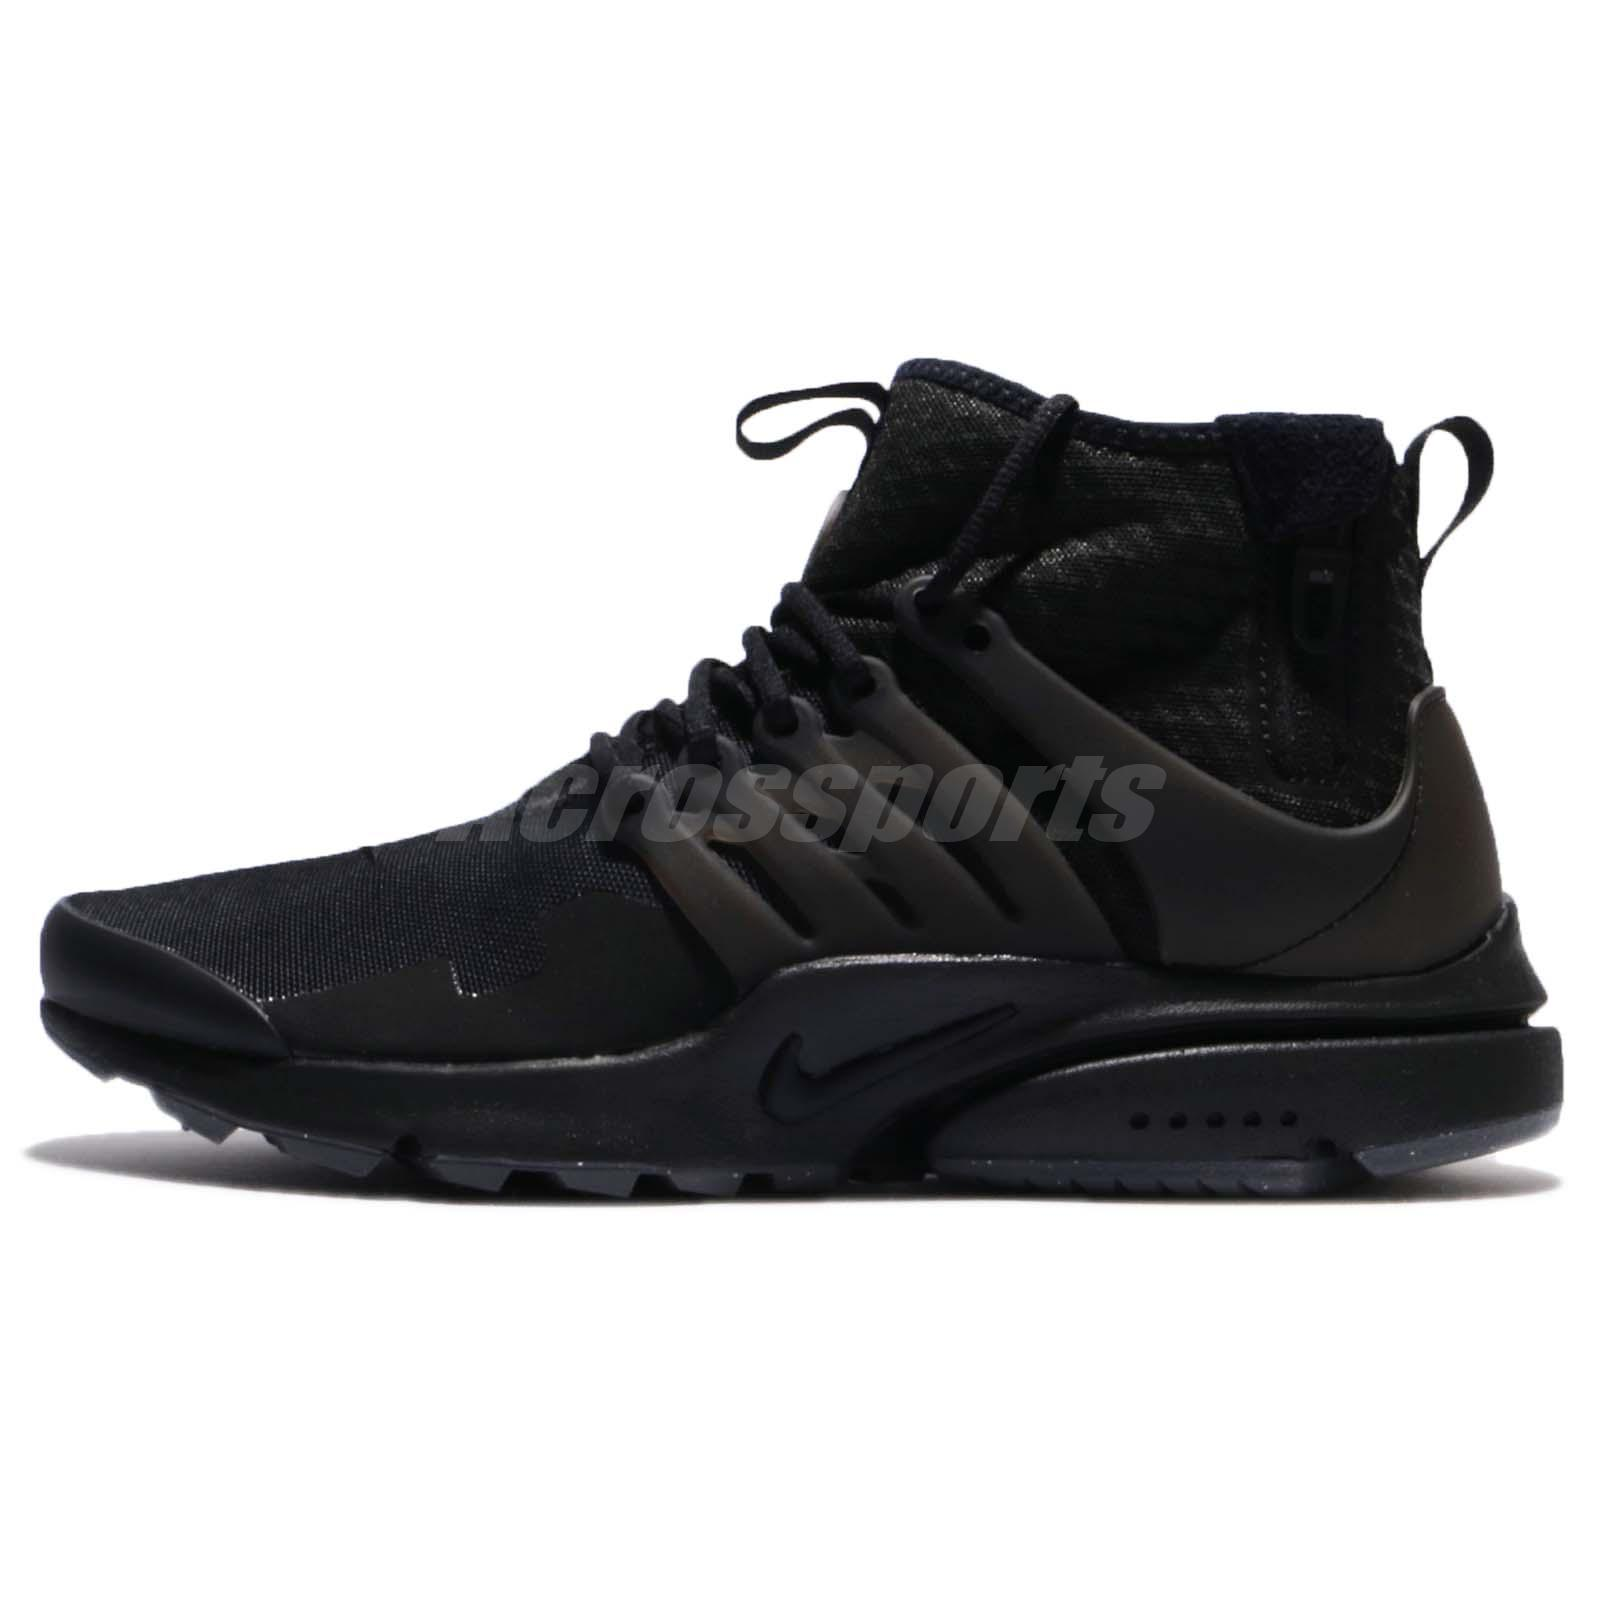 the best attitude e9e1f c2026 where can i buy nike air presto mid utility black dark grey zip men shoes  sneakers